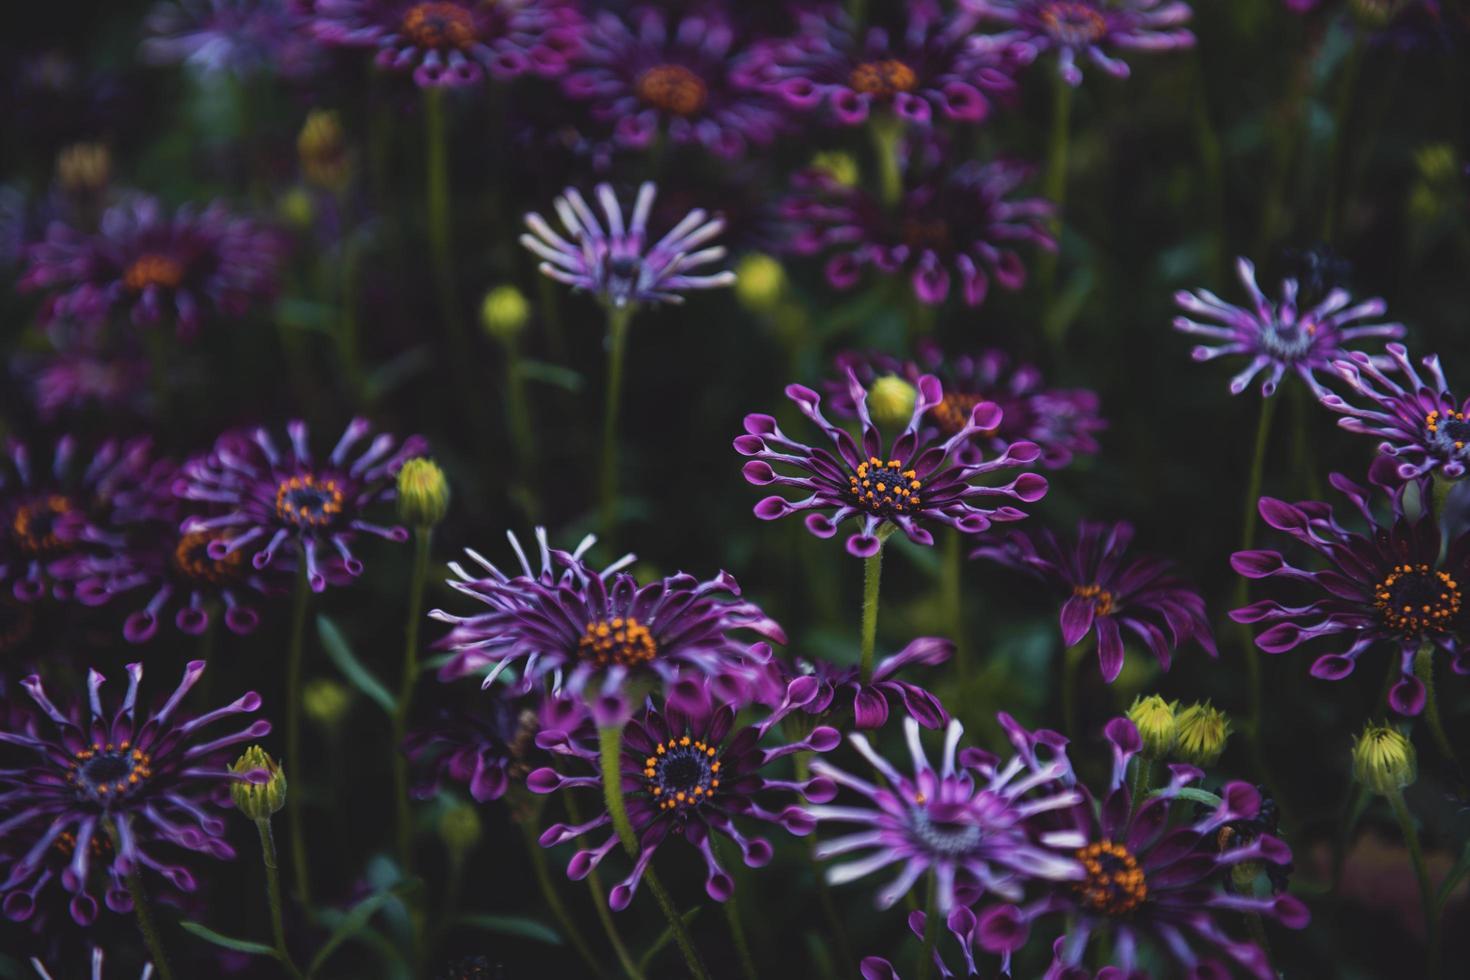 Foto de enfoque superficial de flores de color púrpura